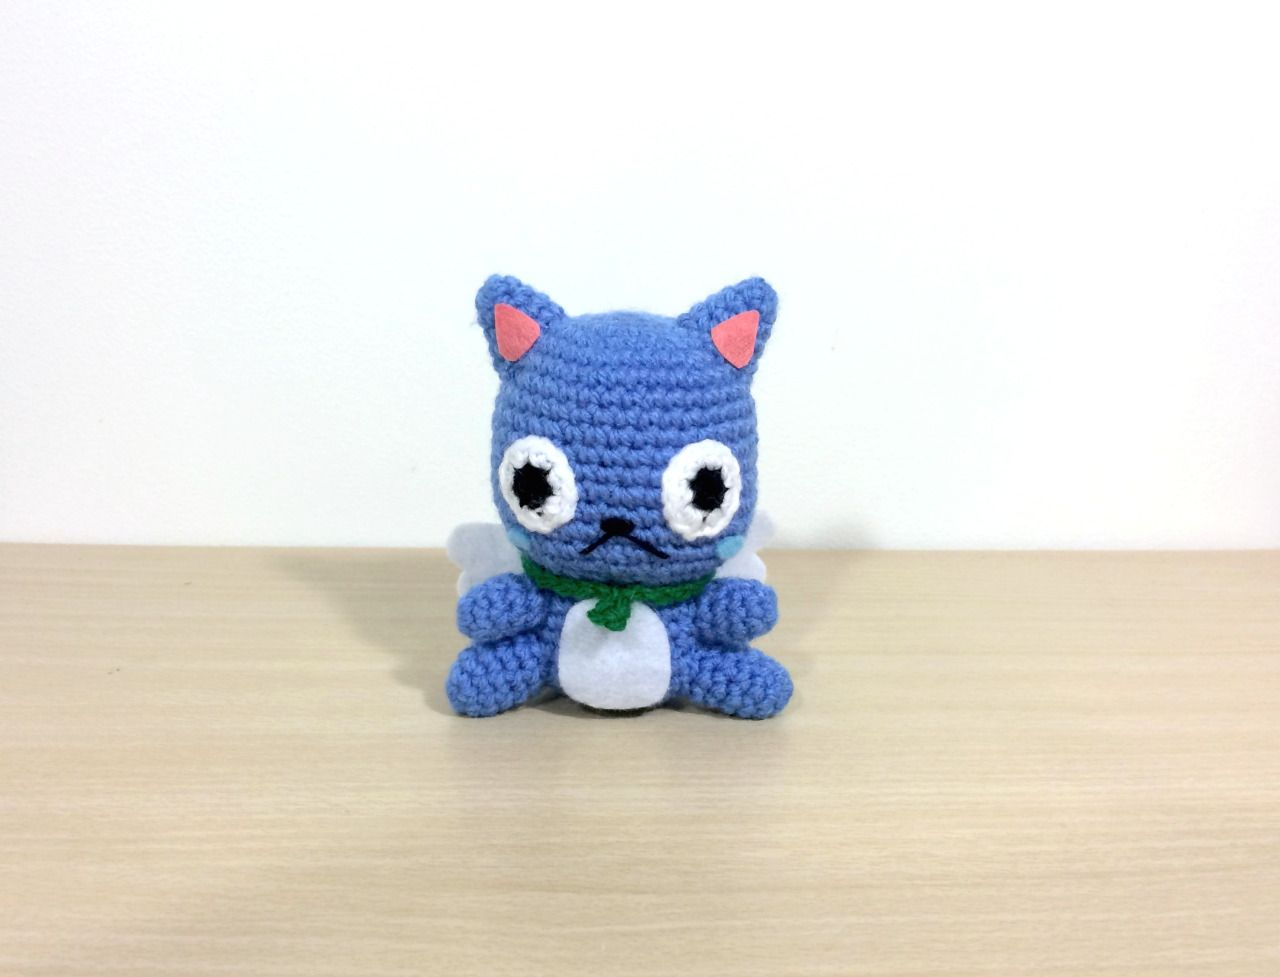 Amigurumi Totoro Receita : Amigurumi brasil u amibr u receitas totalmente em português